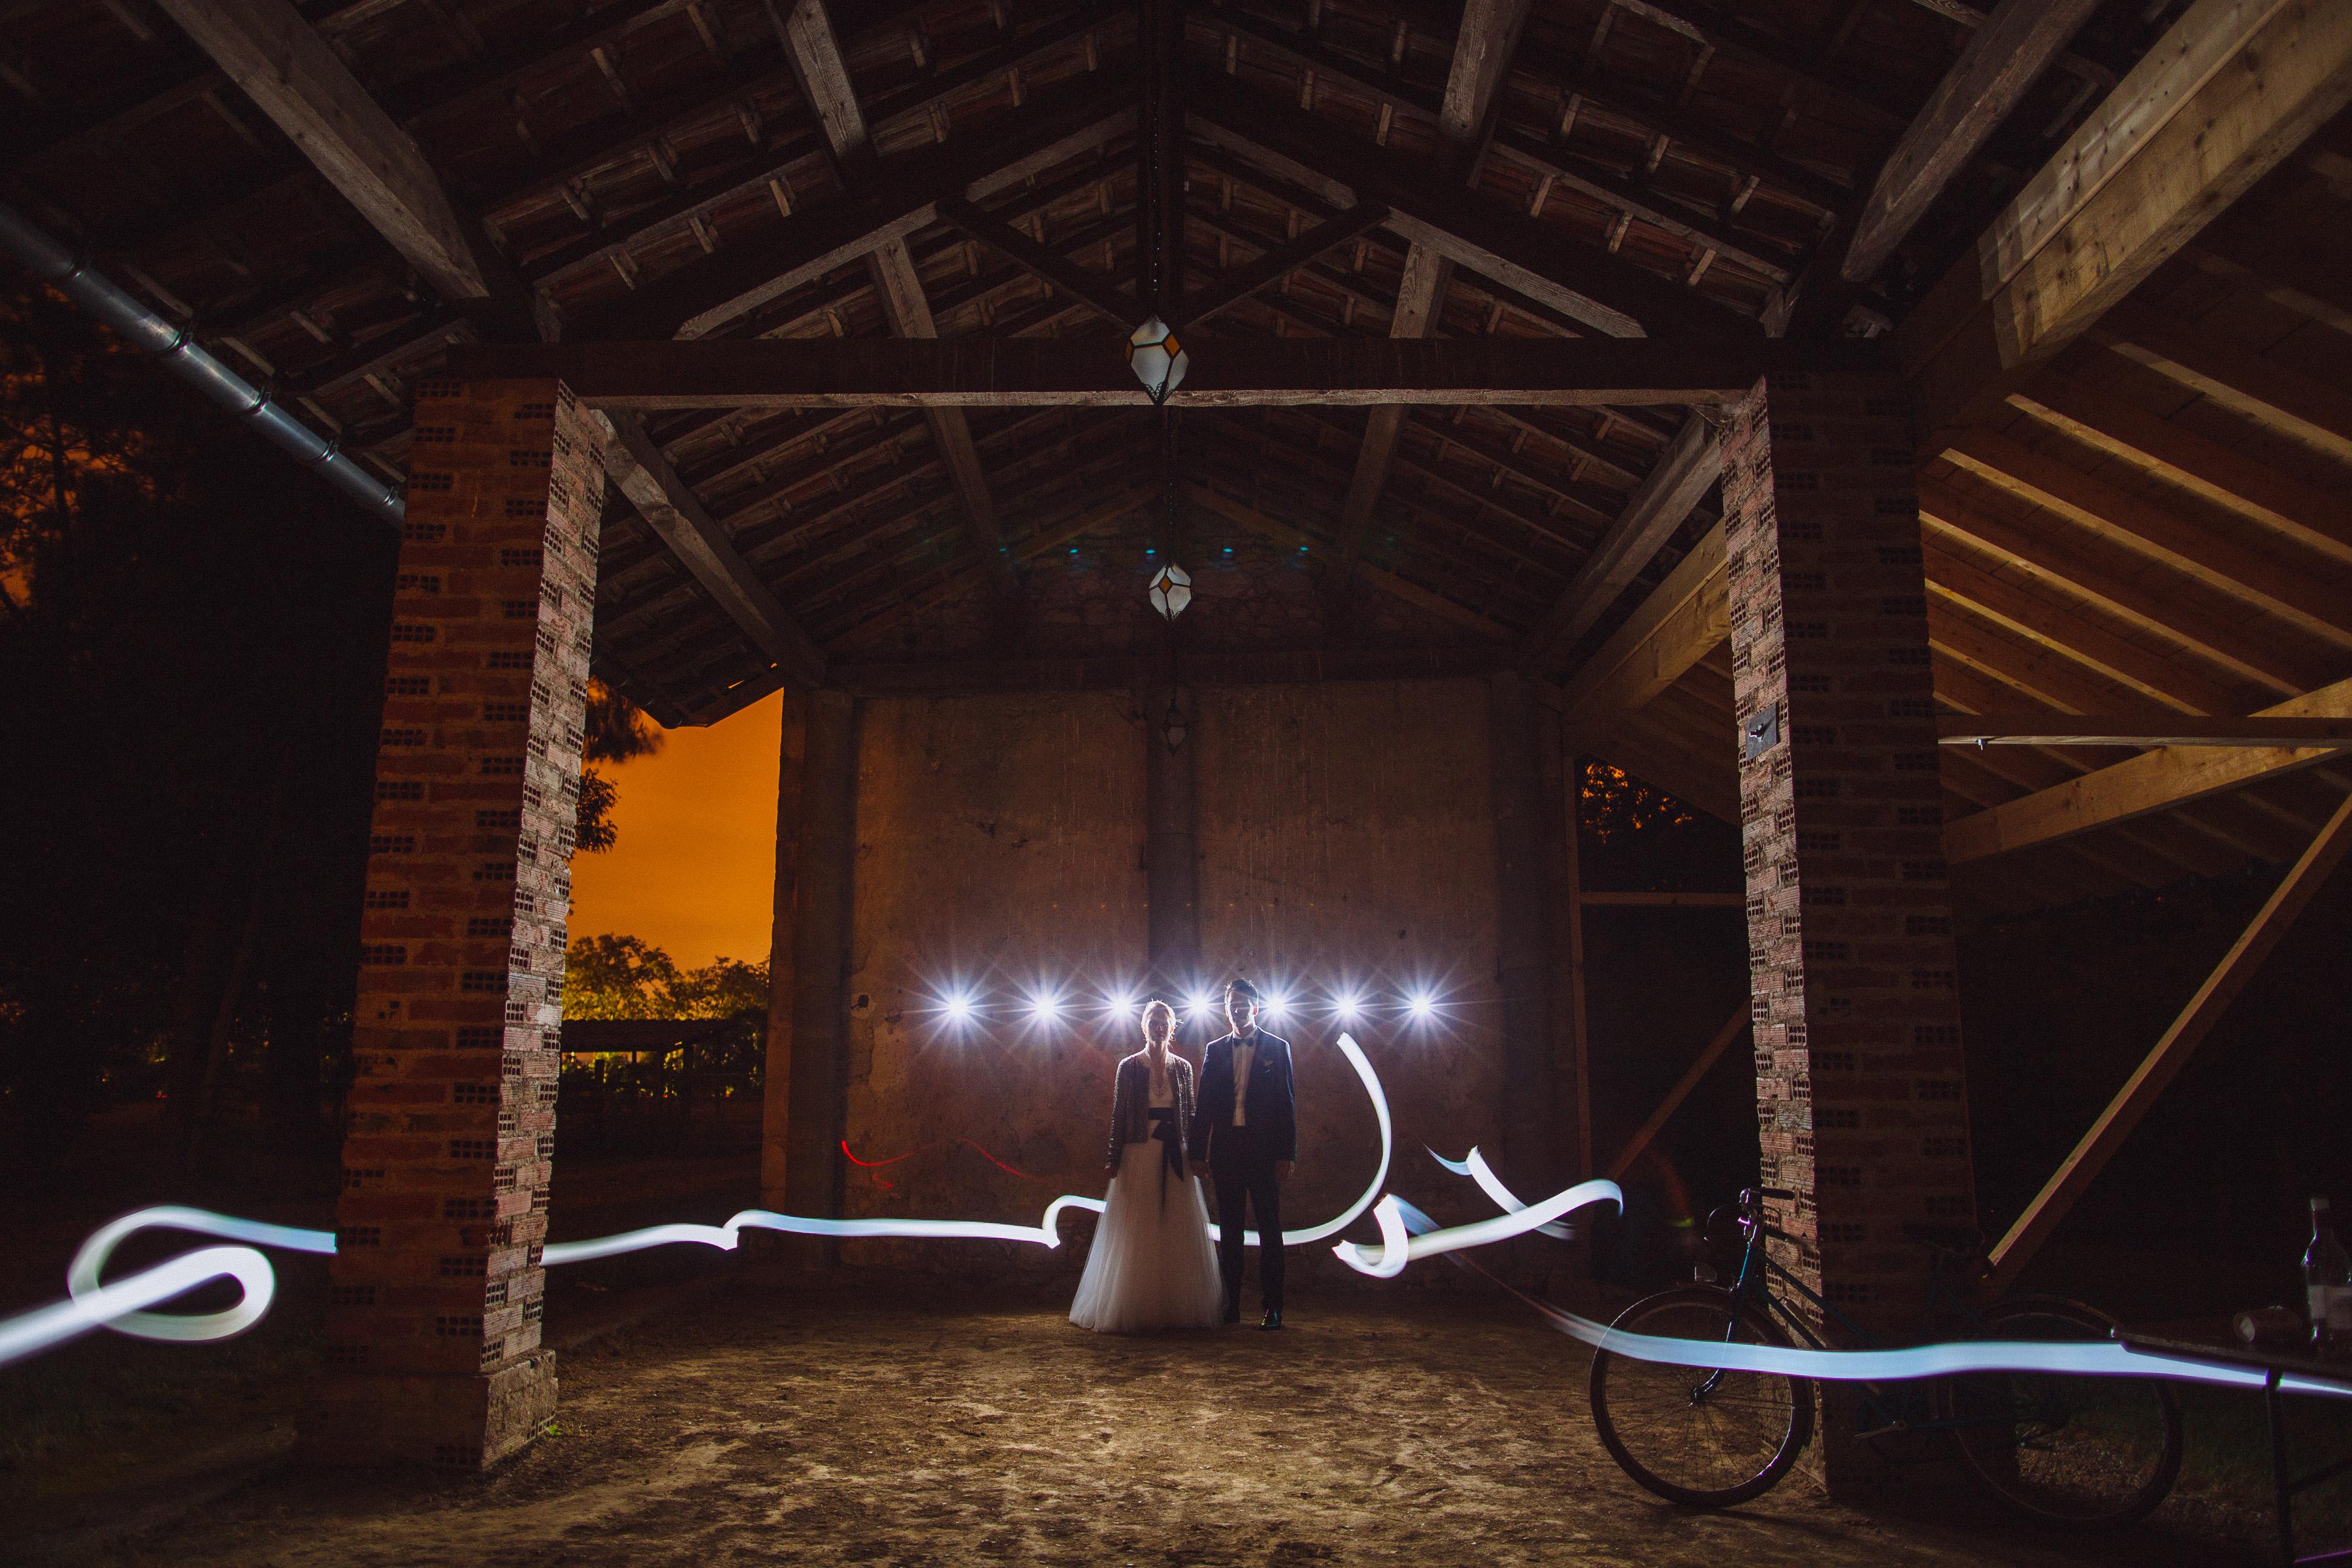 camille_nico___mariage_____ricardo_vieira_photographe_407